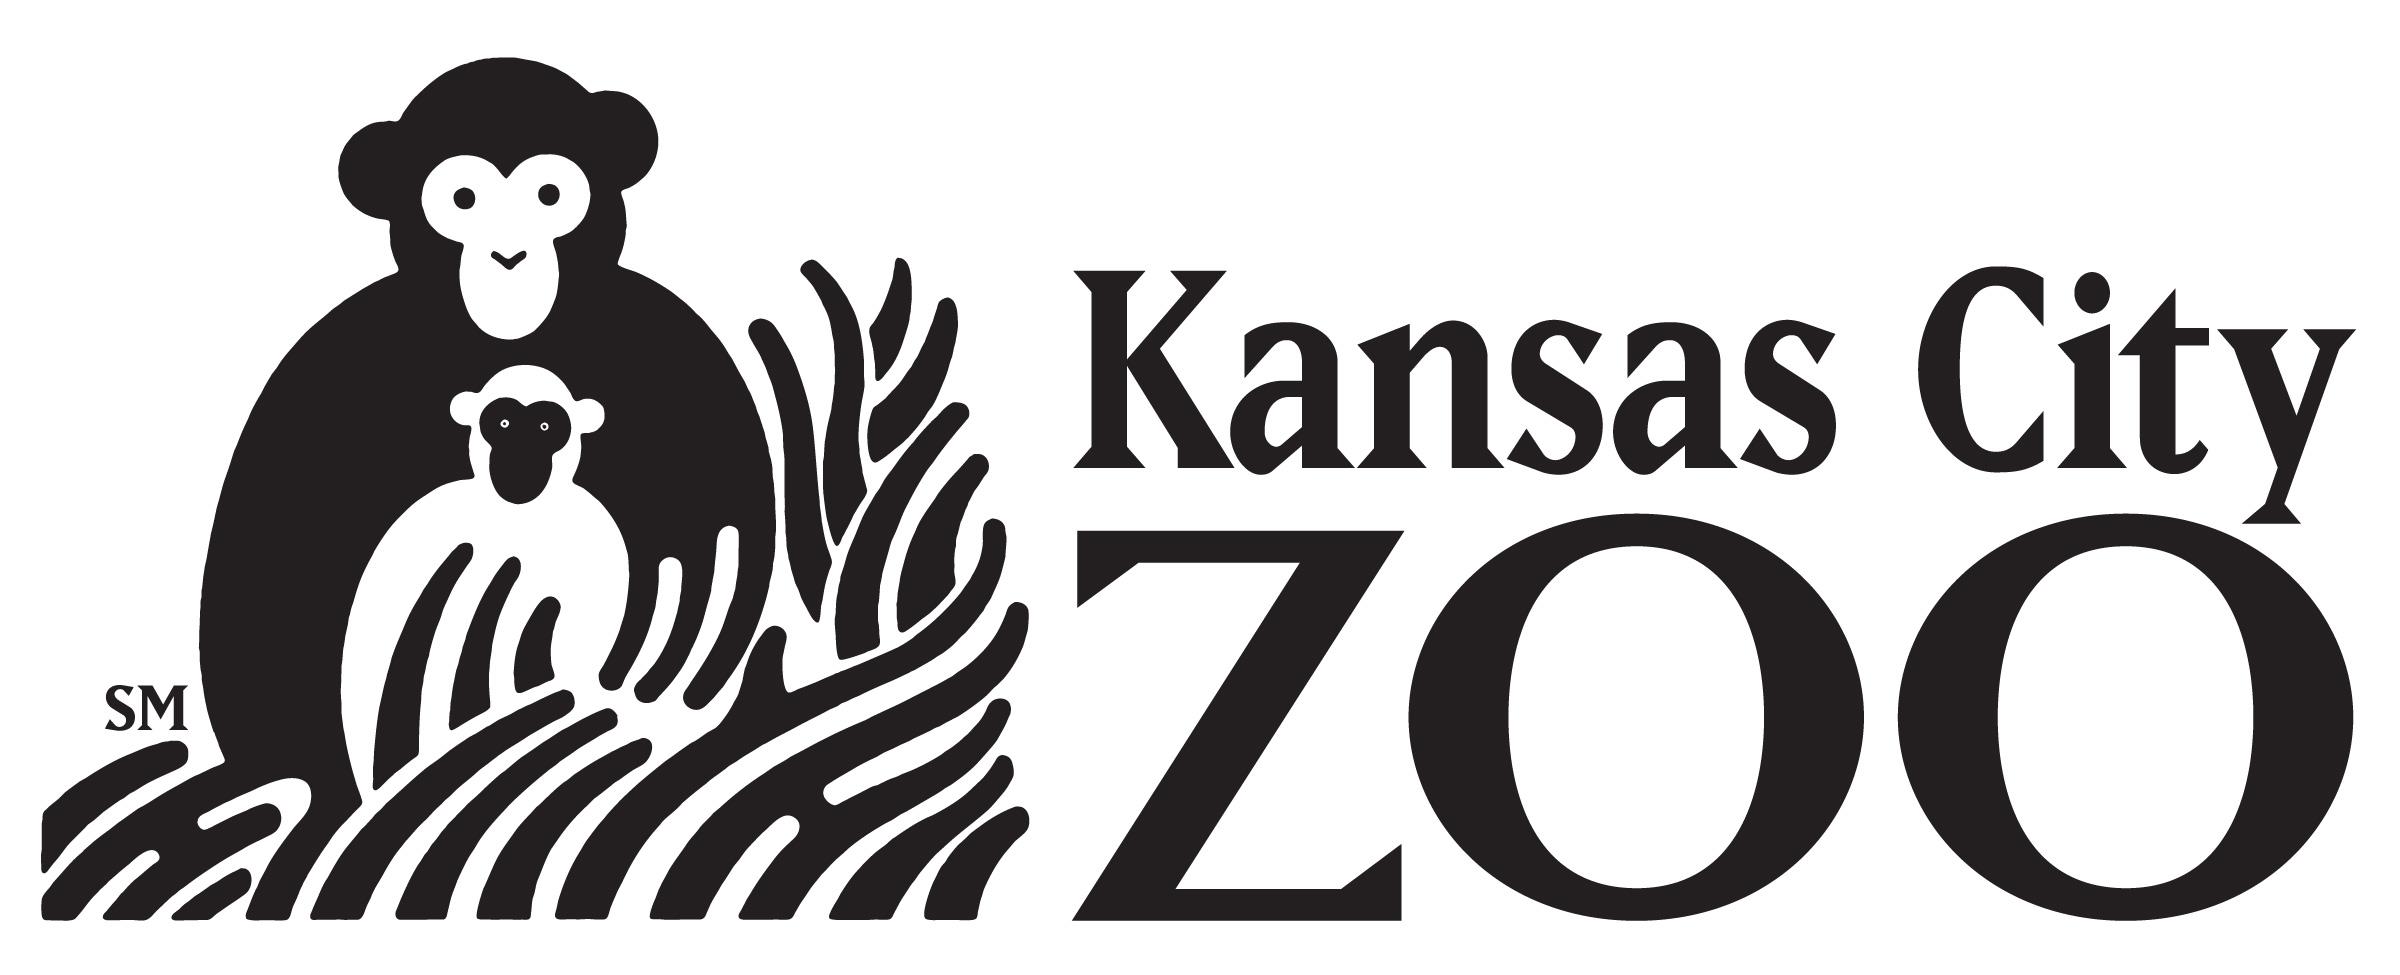 kczoo-horizontal